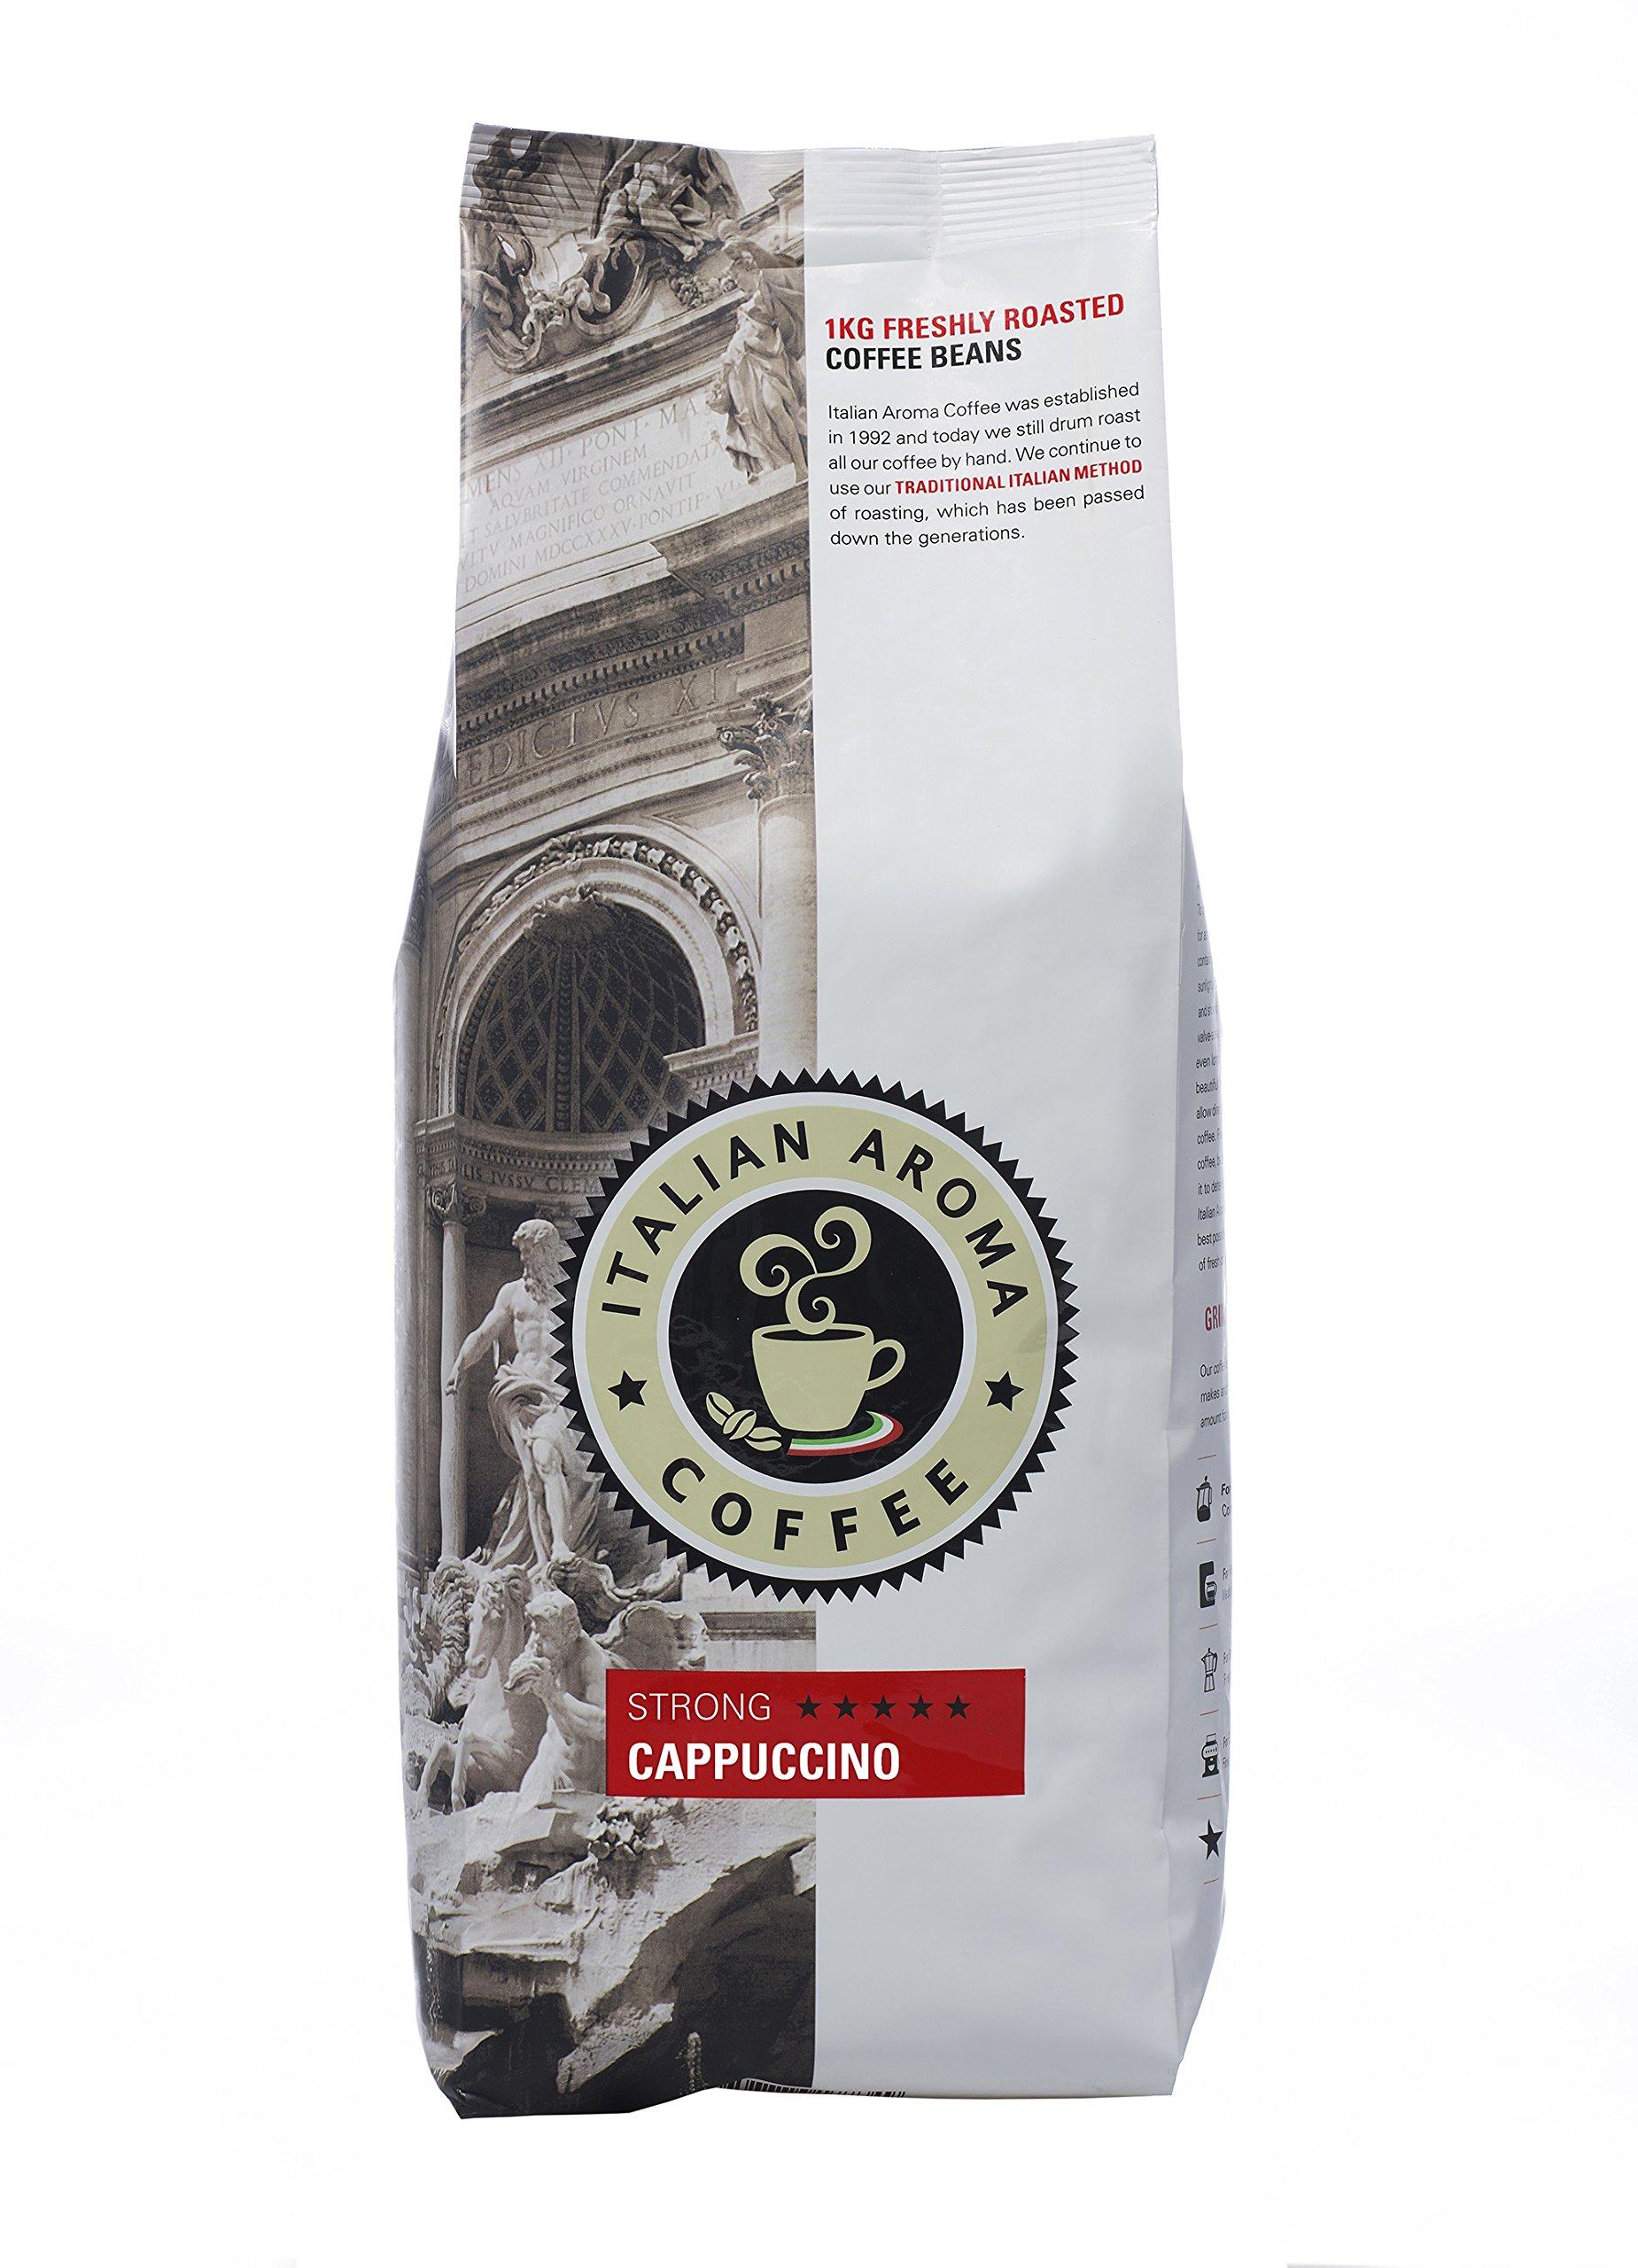 Italian-Aroma-Coffee-1KG-Whole-Coffee-Beans-Traditional-Italian-Coffee-Flavour